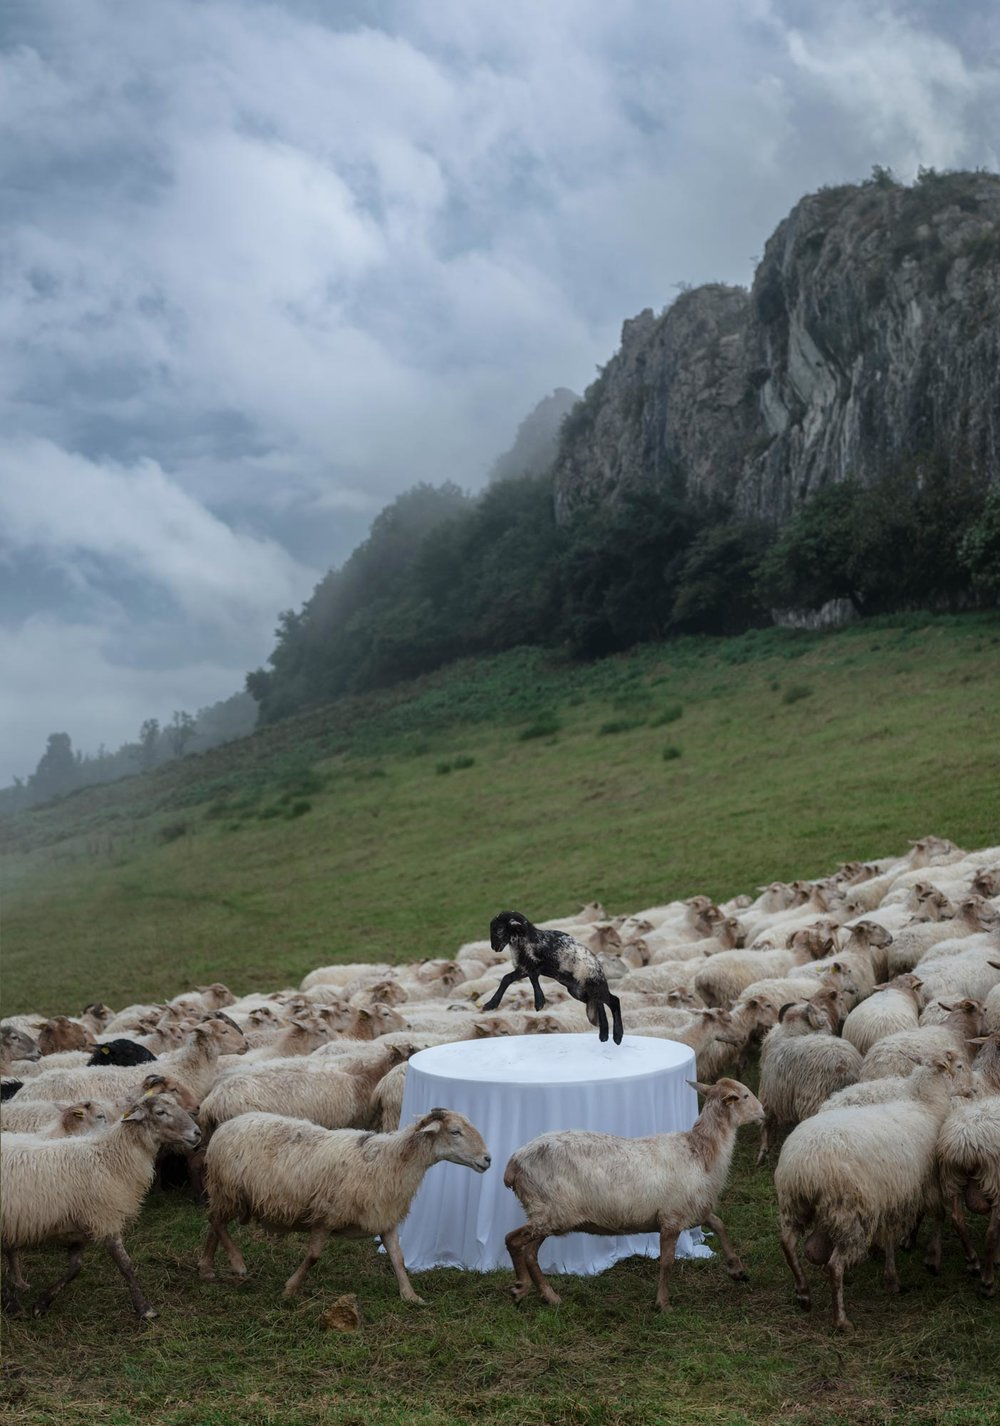 mugaritz_1808__0049_meck_flat_5_sheep_FINAL.jpg